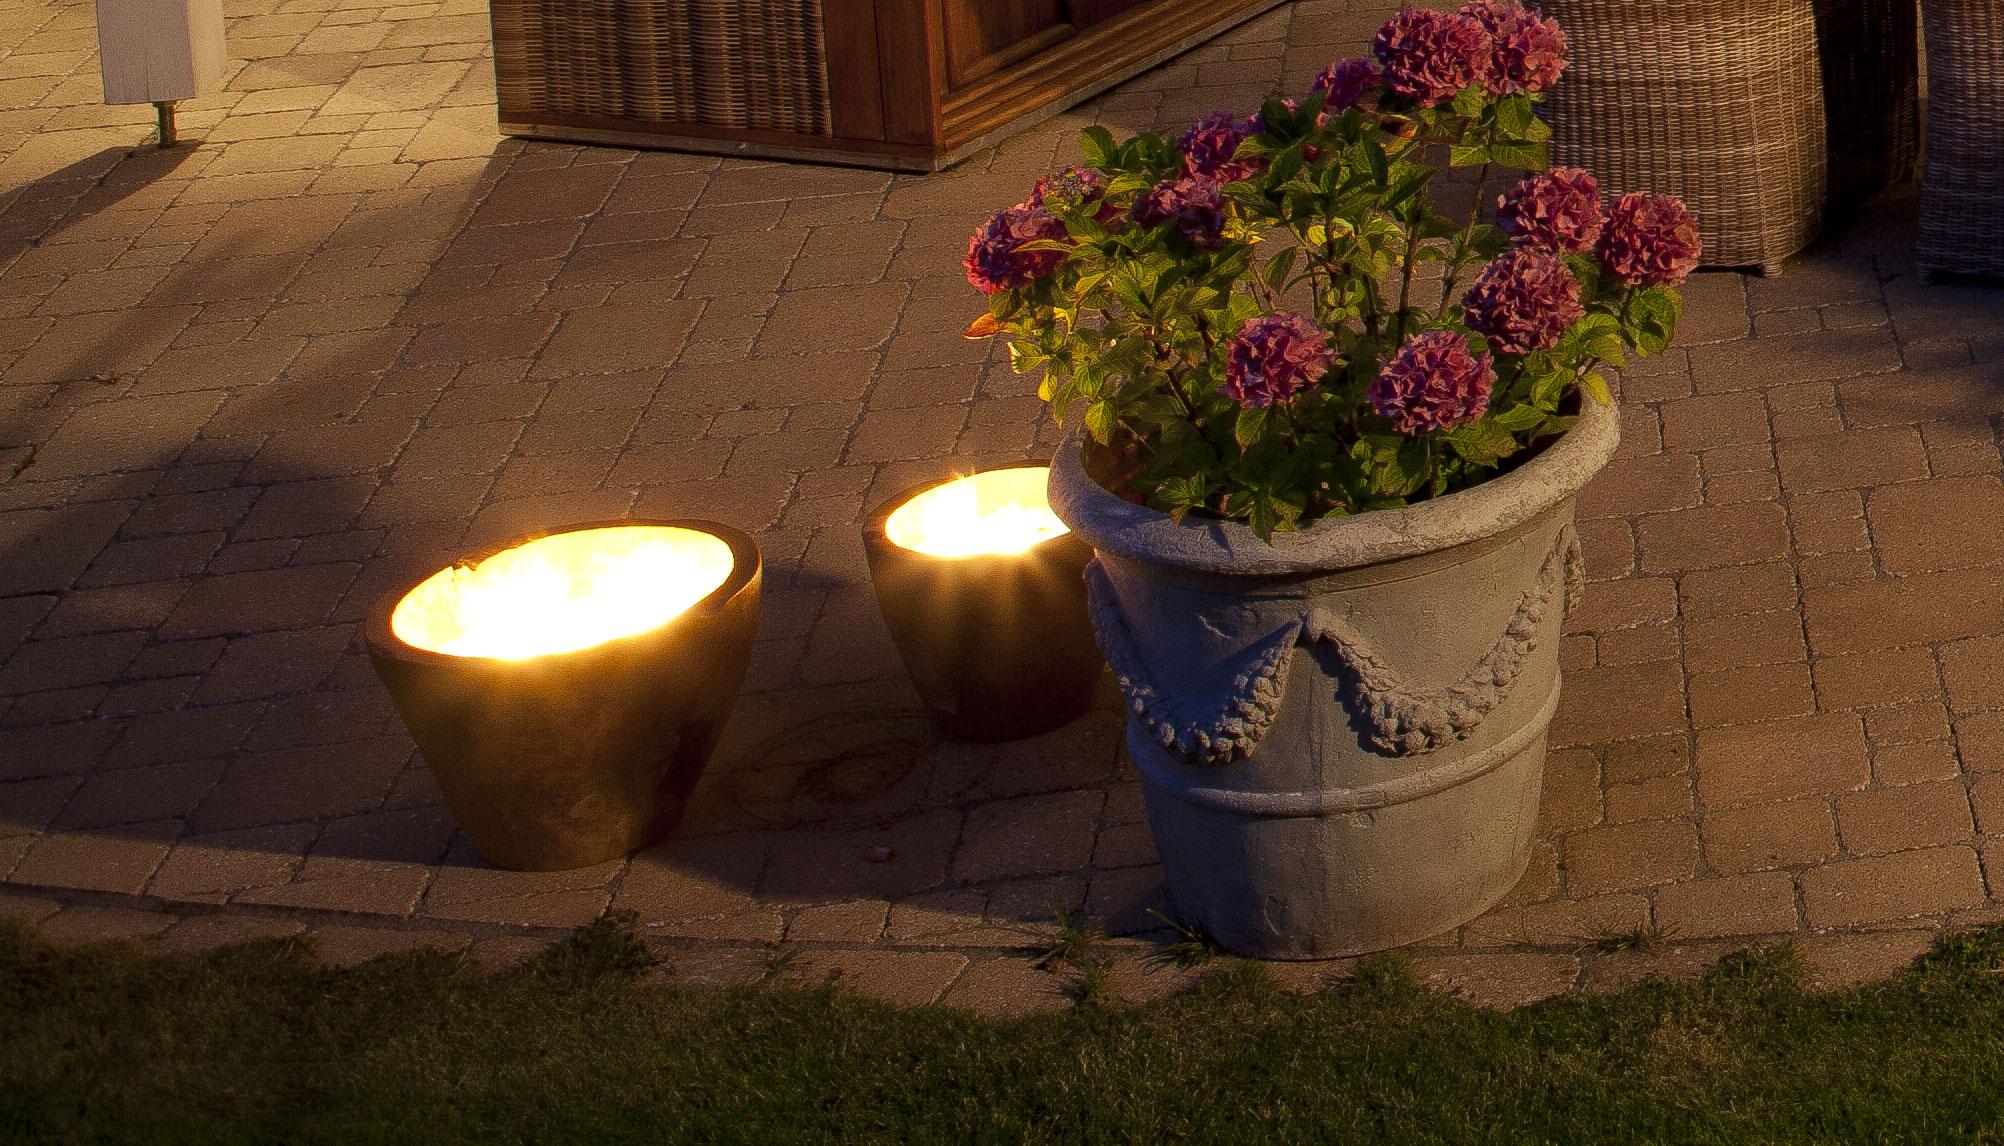 Sonnenpartner teakholz kerzen candle 30cm bei for Gartendeko kerzen